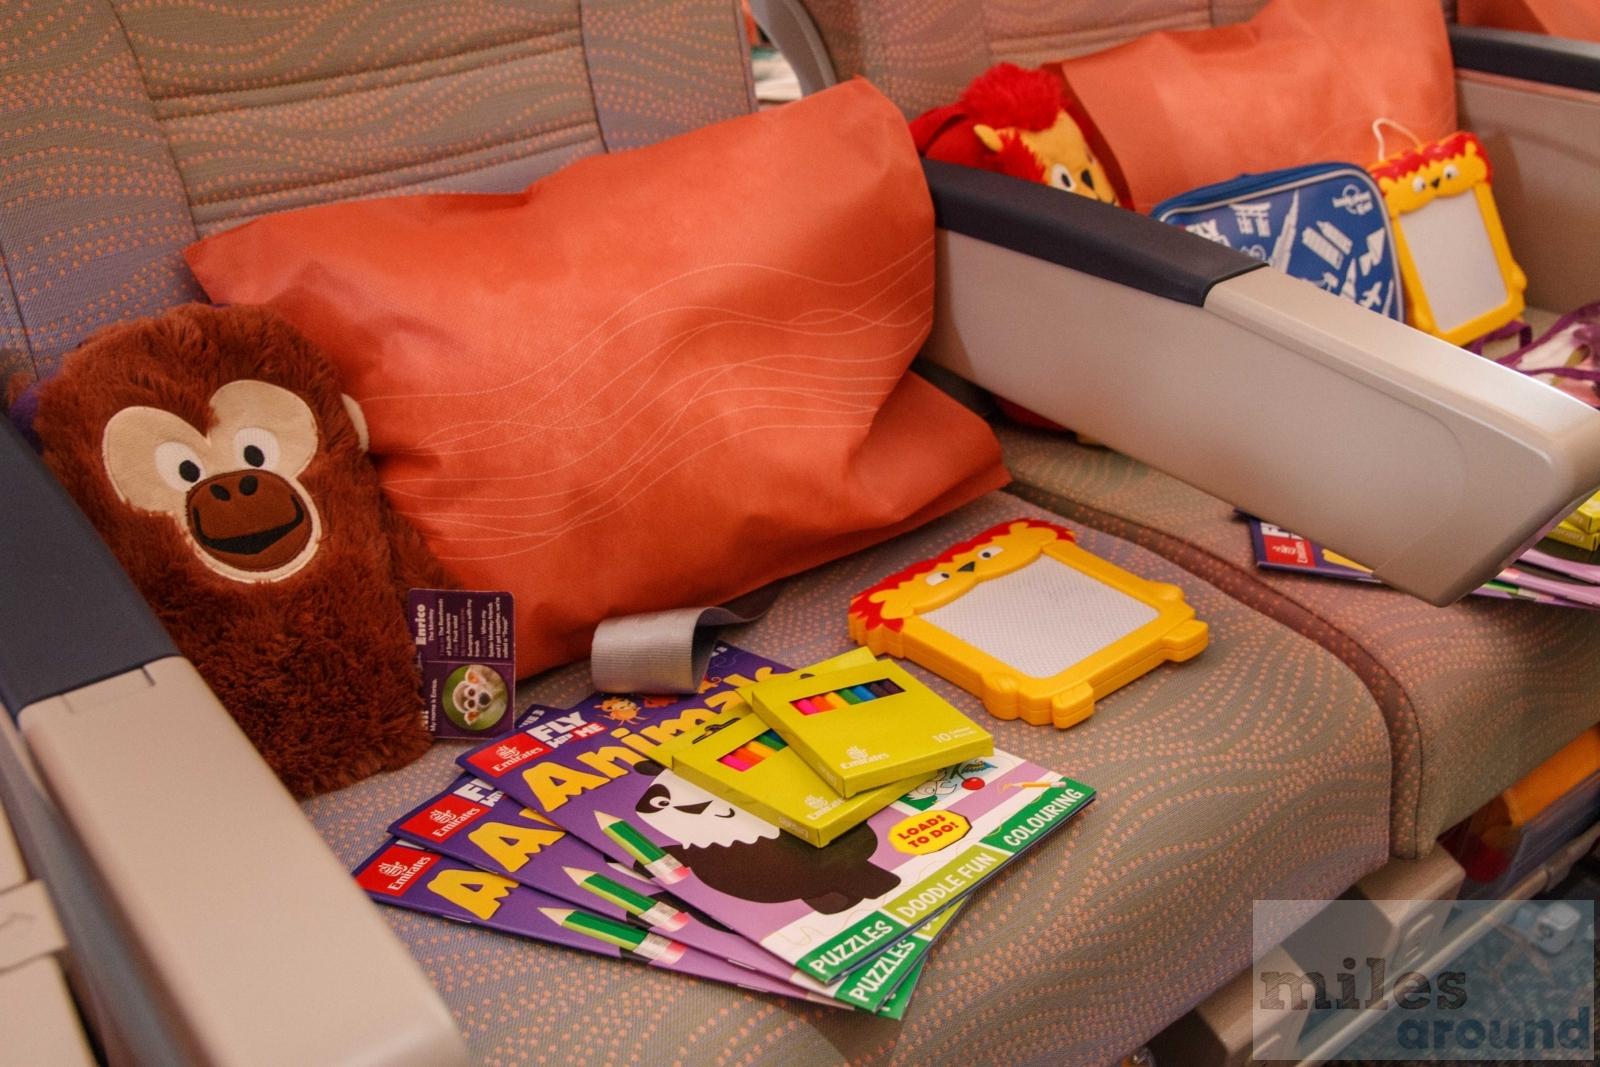 Emirates Economy Class Amenity Kit Airline Bewertung: Emi...